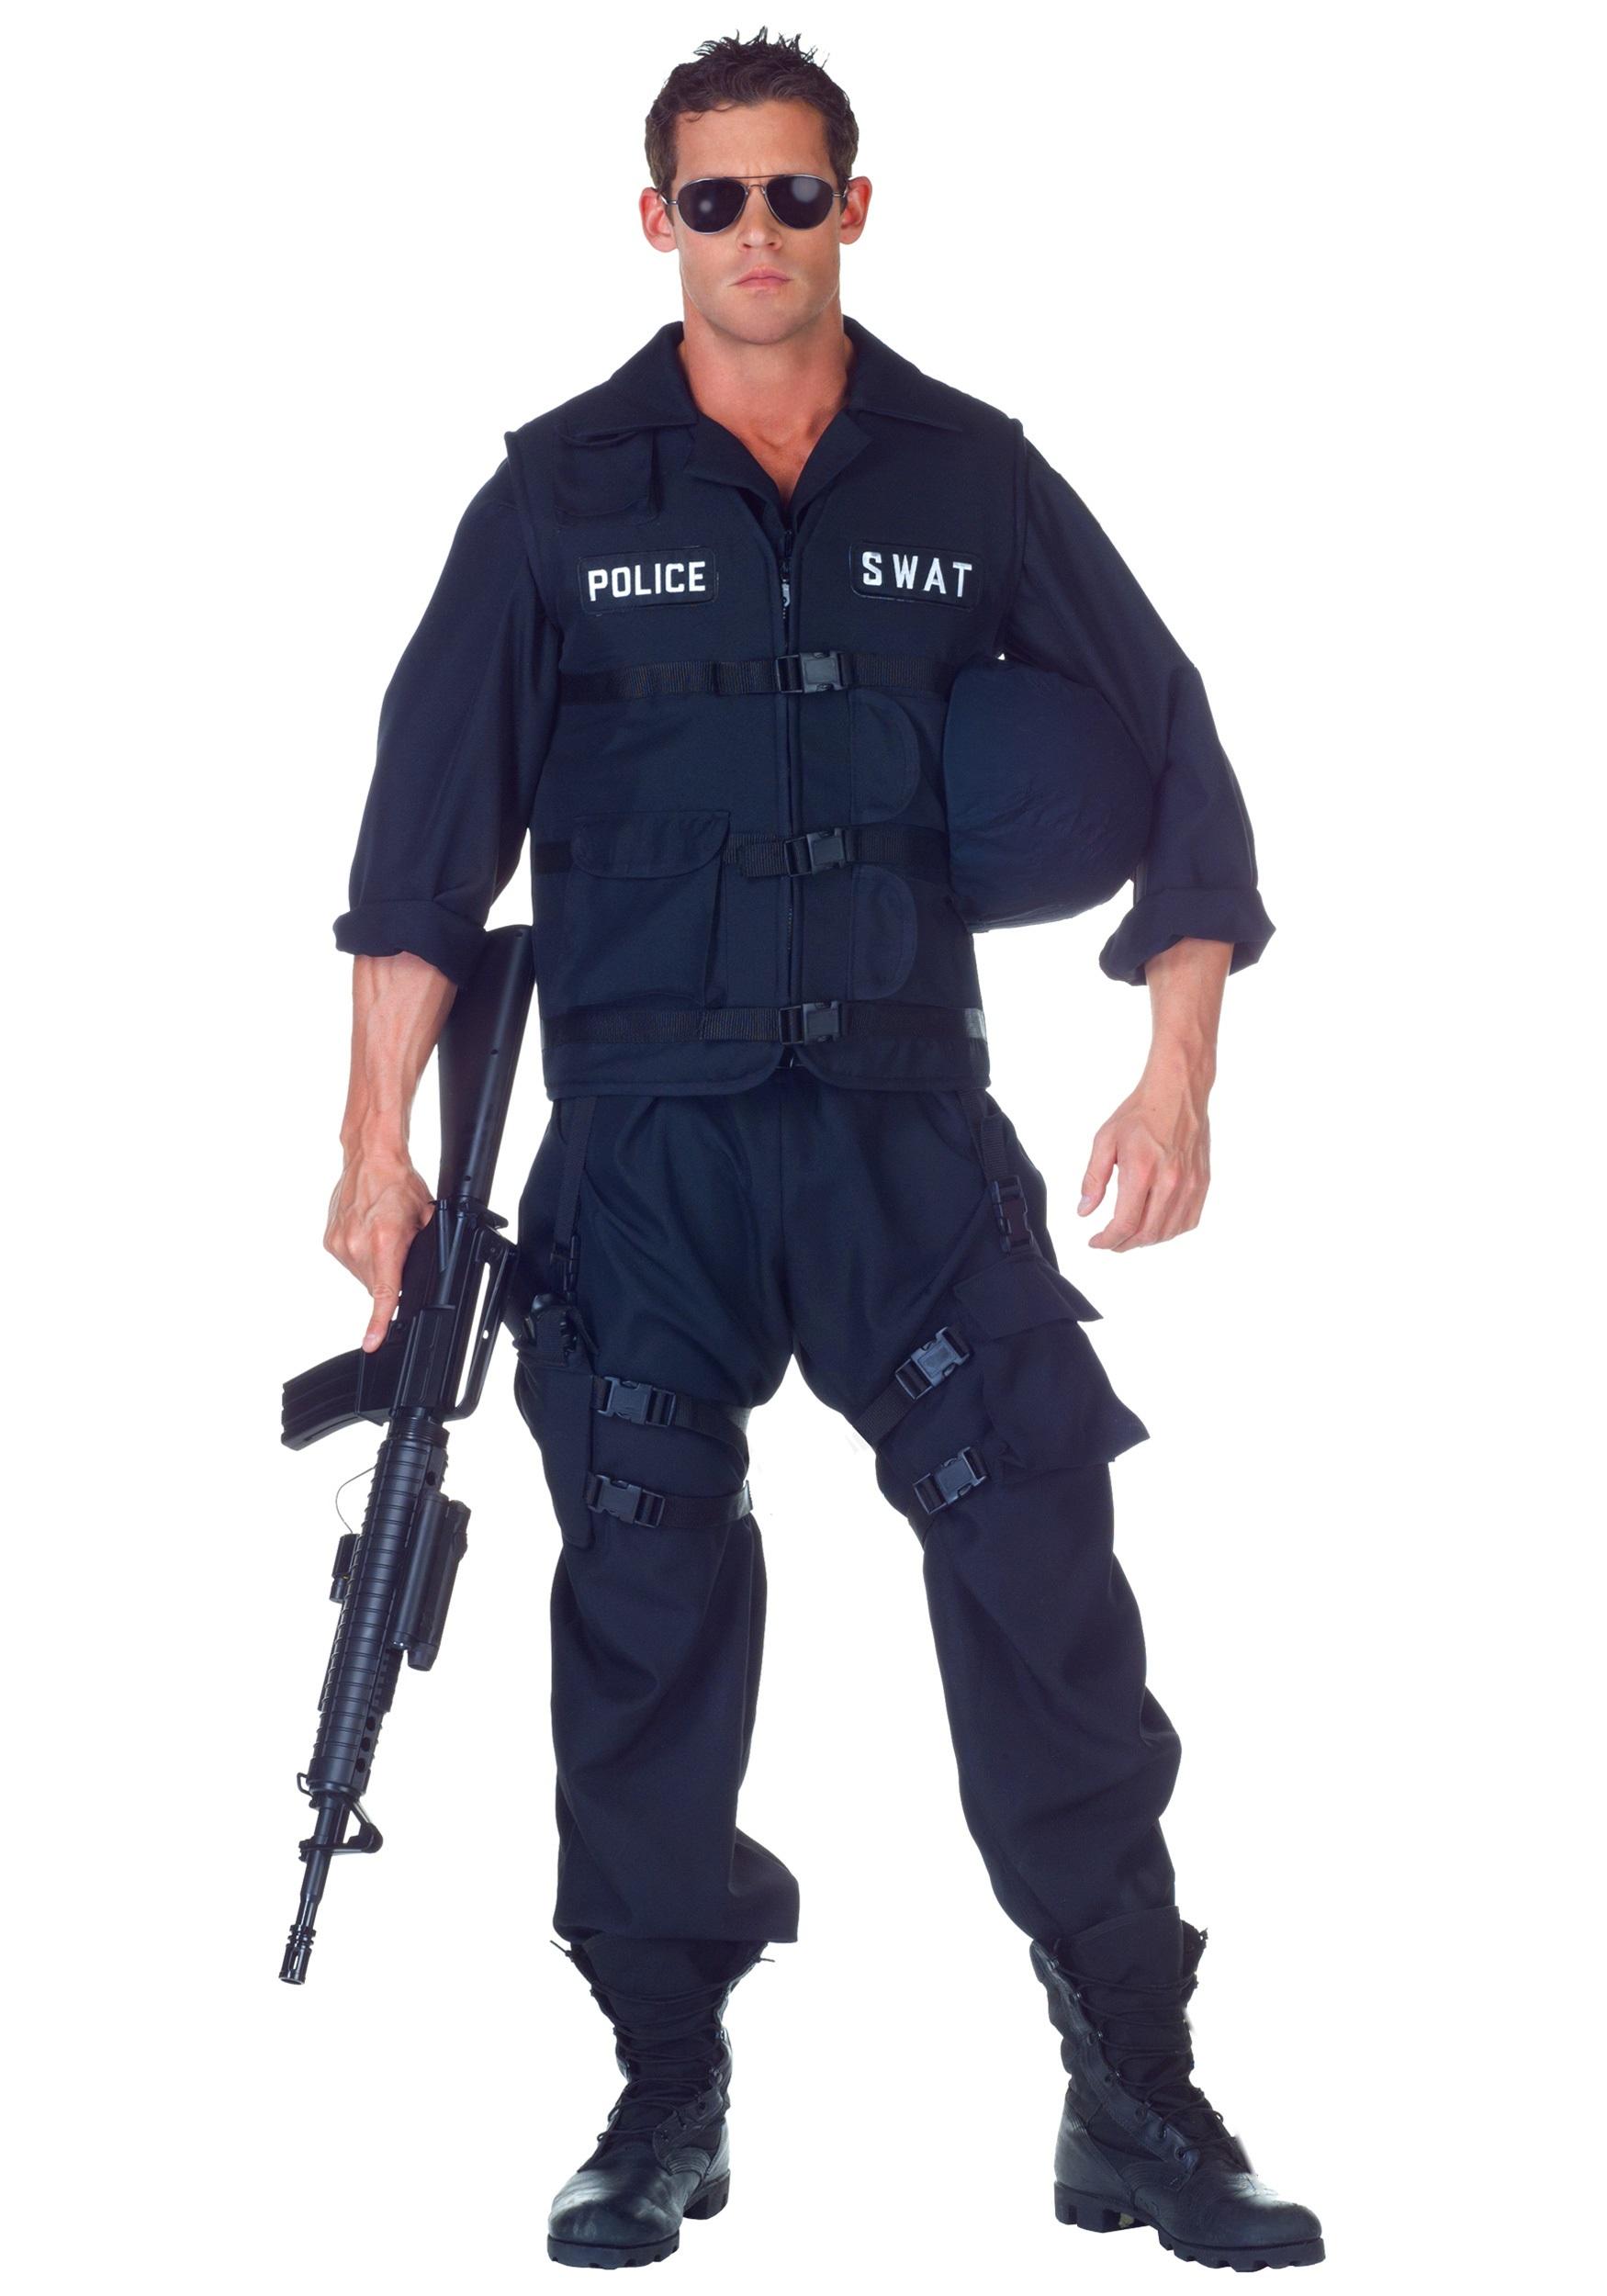 SWAT Officer Jumpsuit Costume  sc 1 st  Halloween Costume & SWAT Officer Jumpsuit Costume - Adult Police Officer Uniform Costume